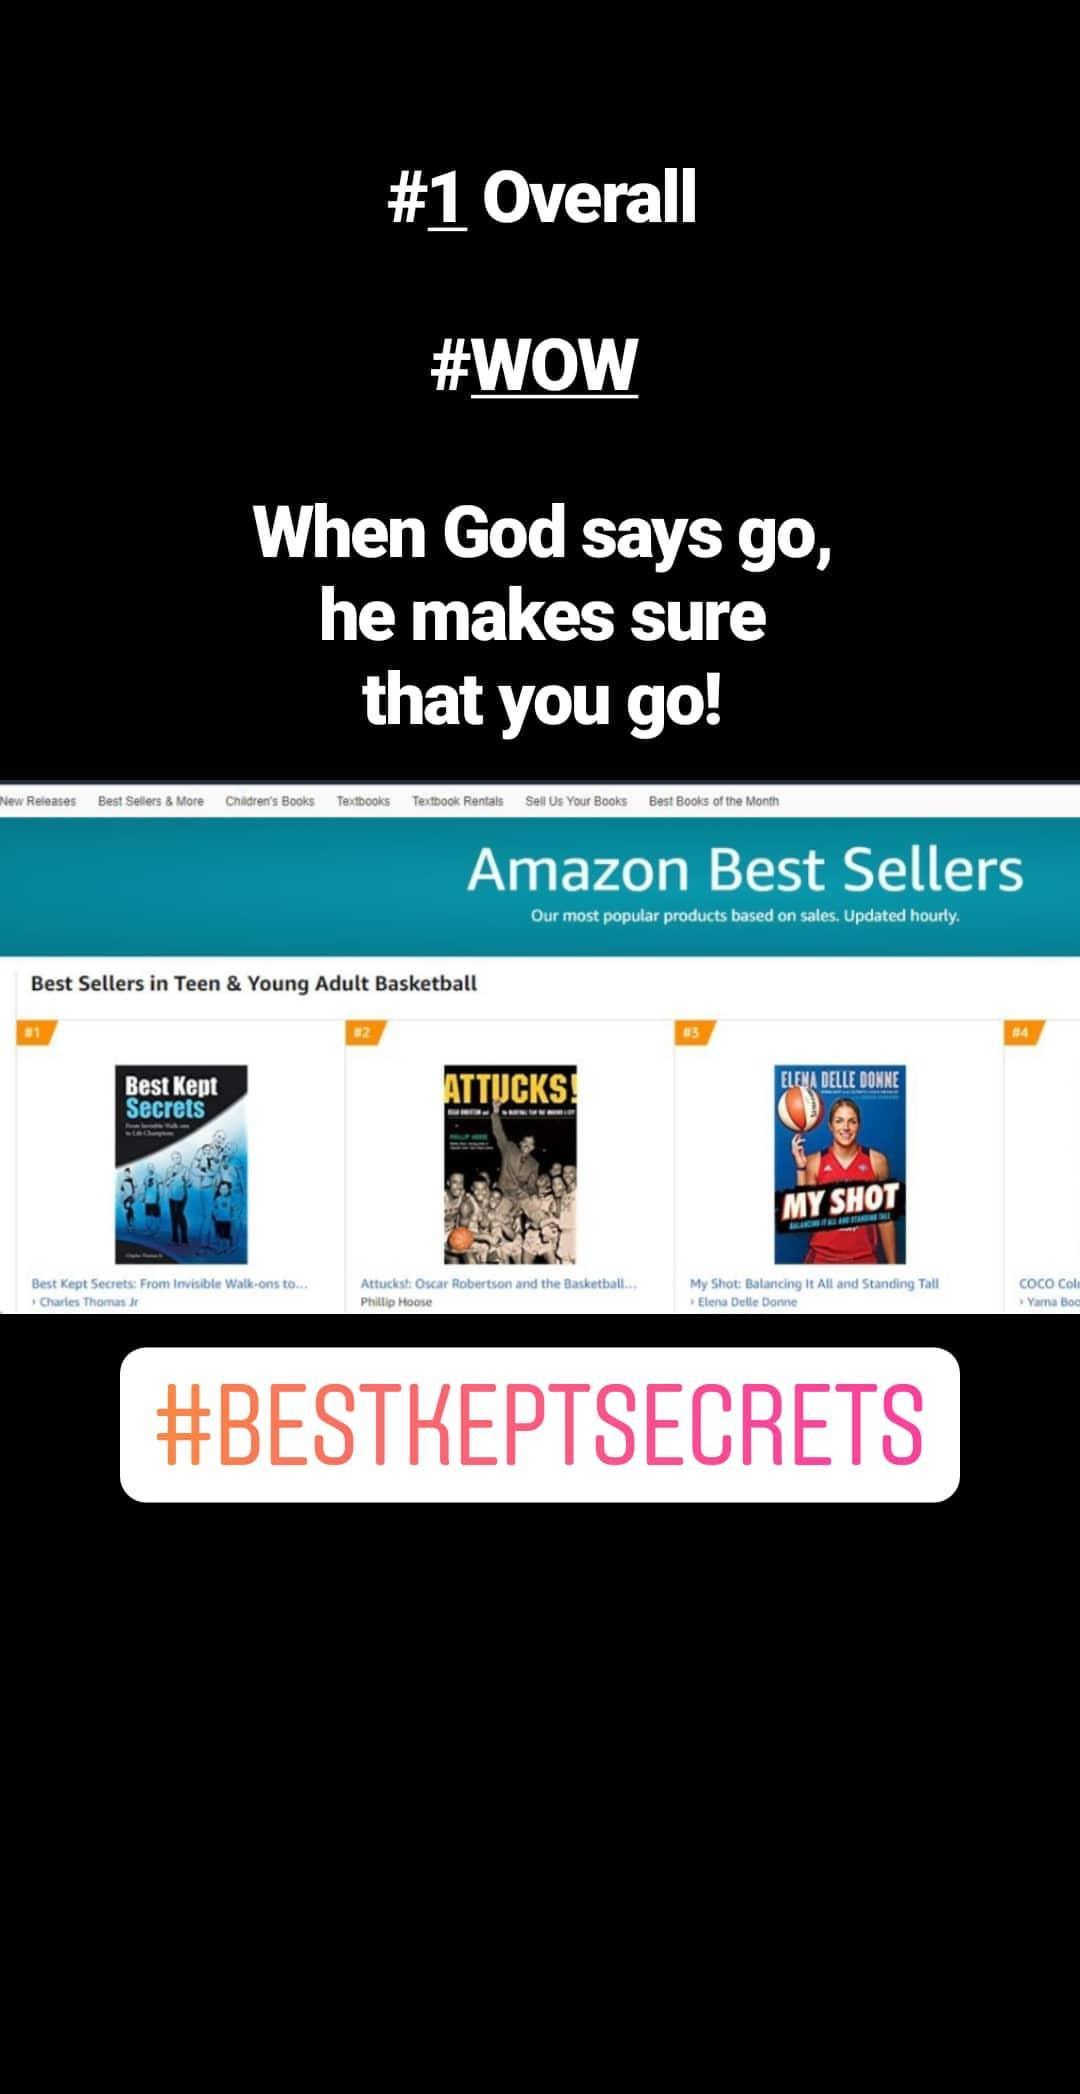 Best Kept Secrets – #1 Amazon Best Seller